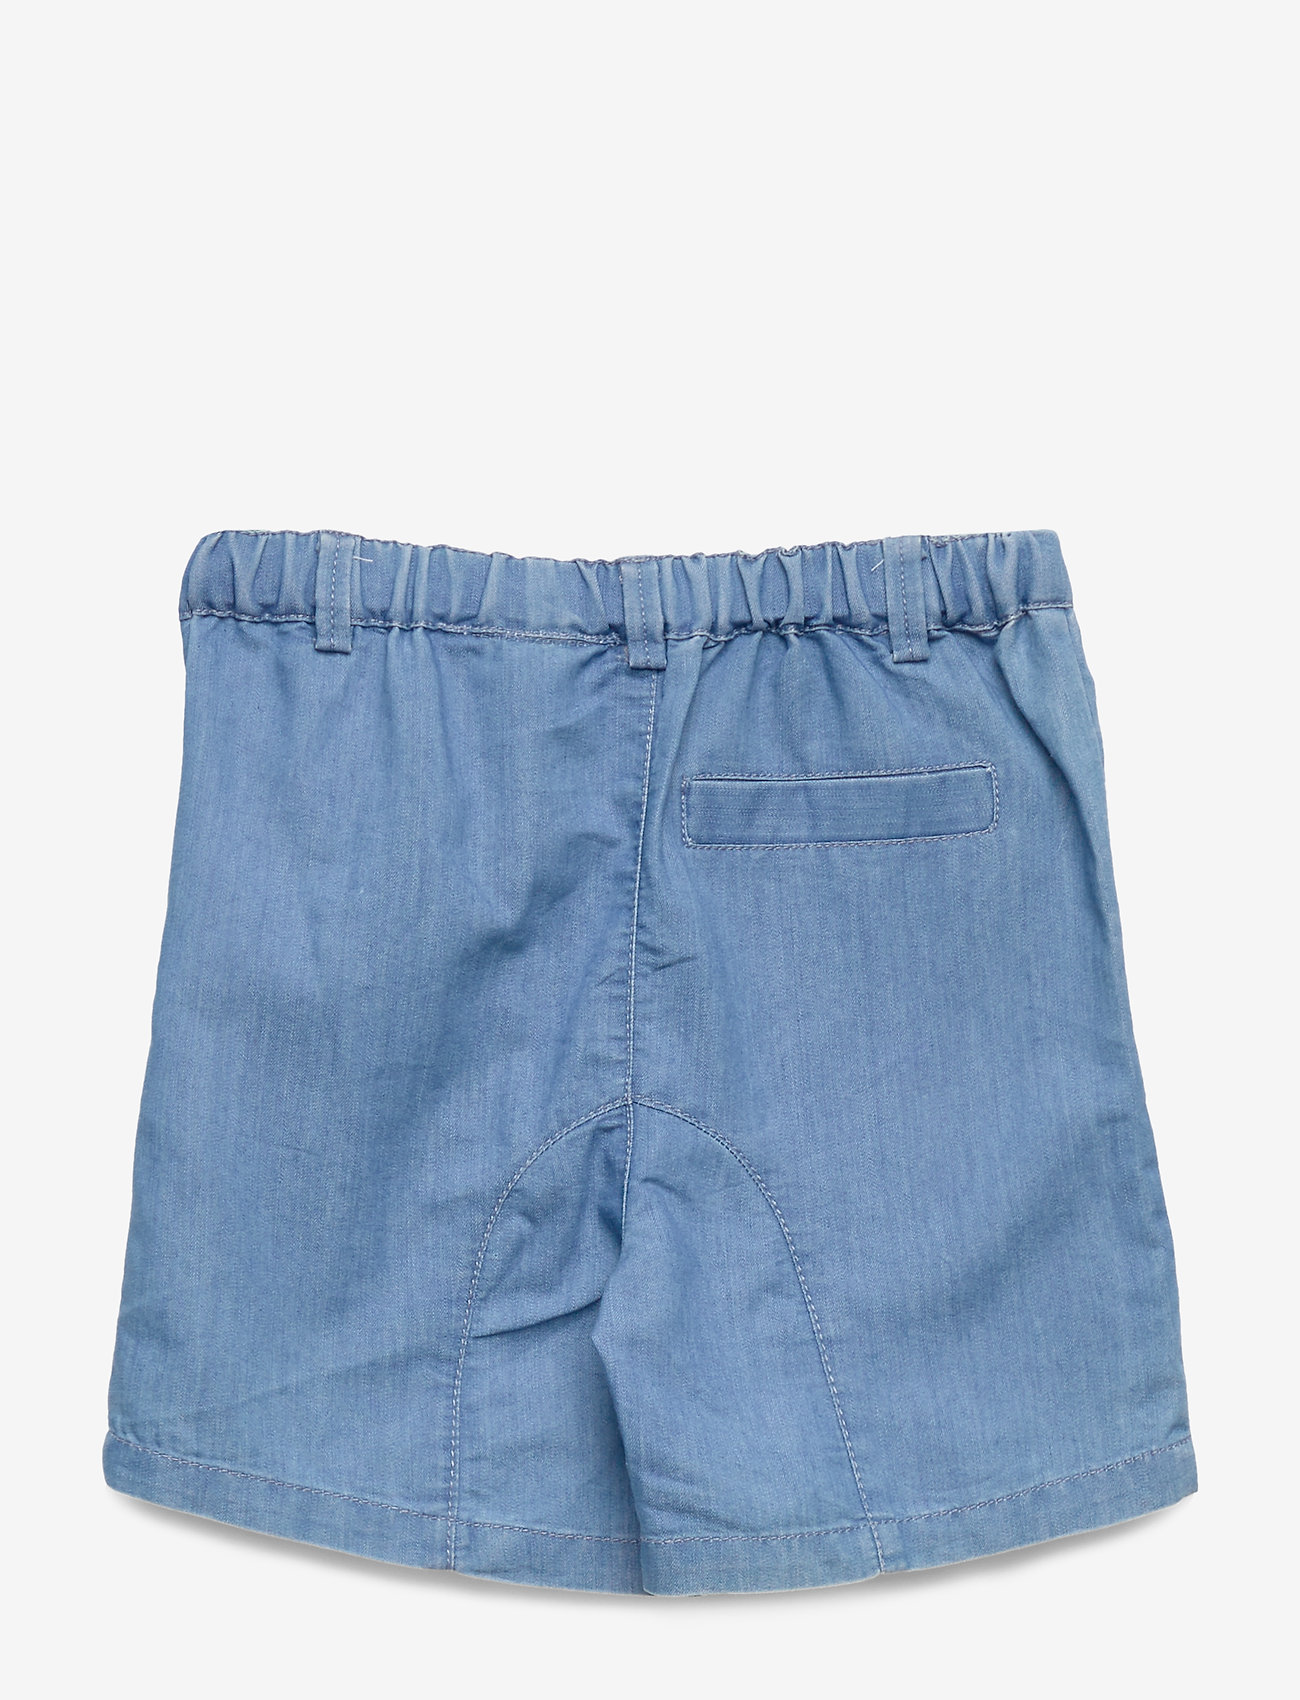 Noa Noa Miniature - Shorts - shorts - blue sapphire - 1